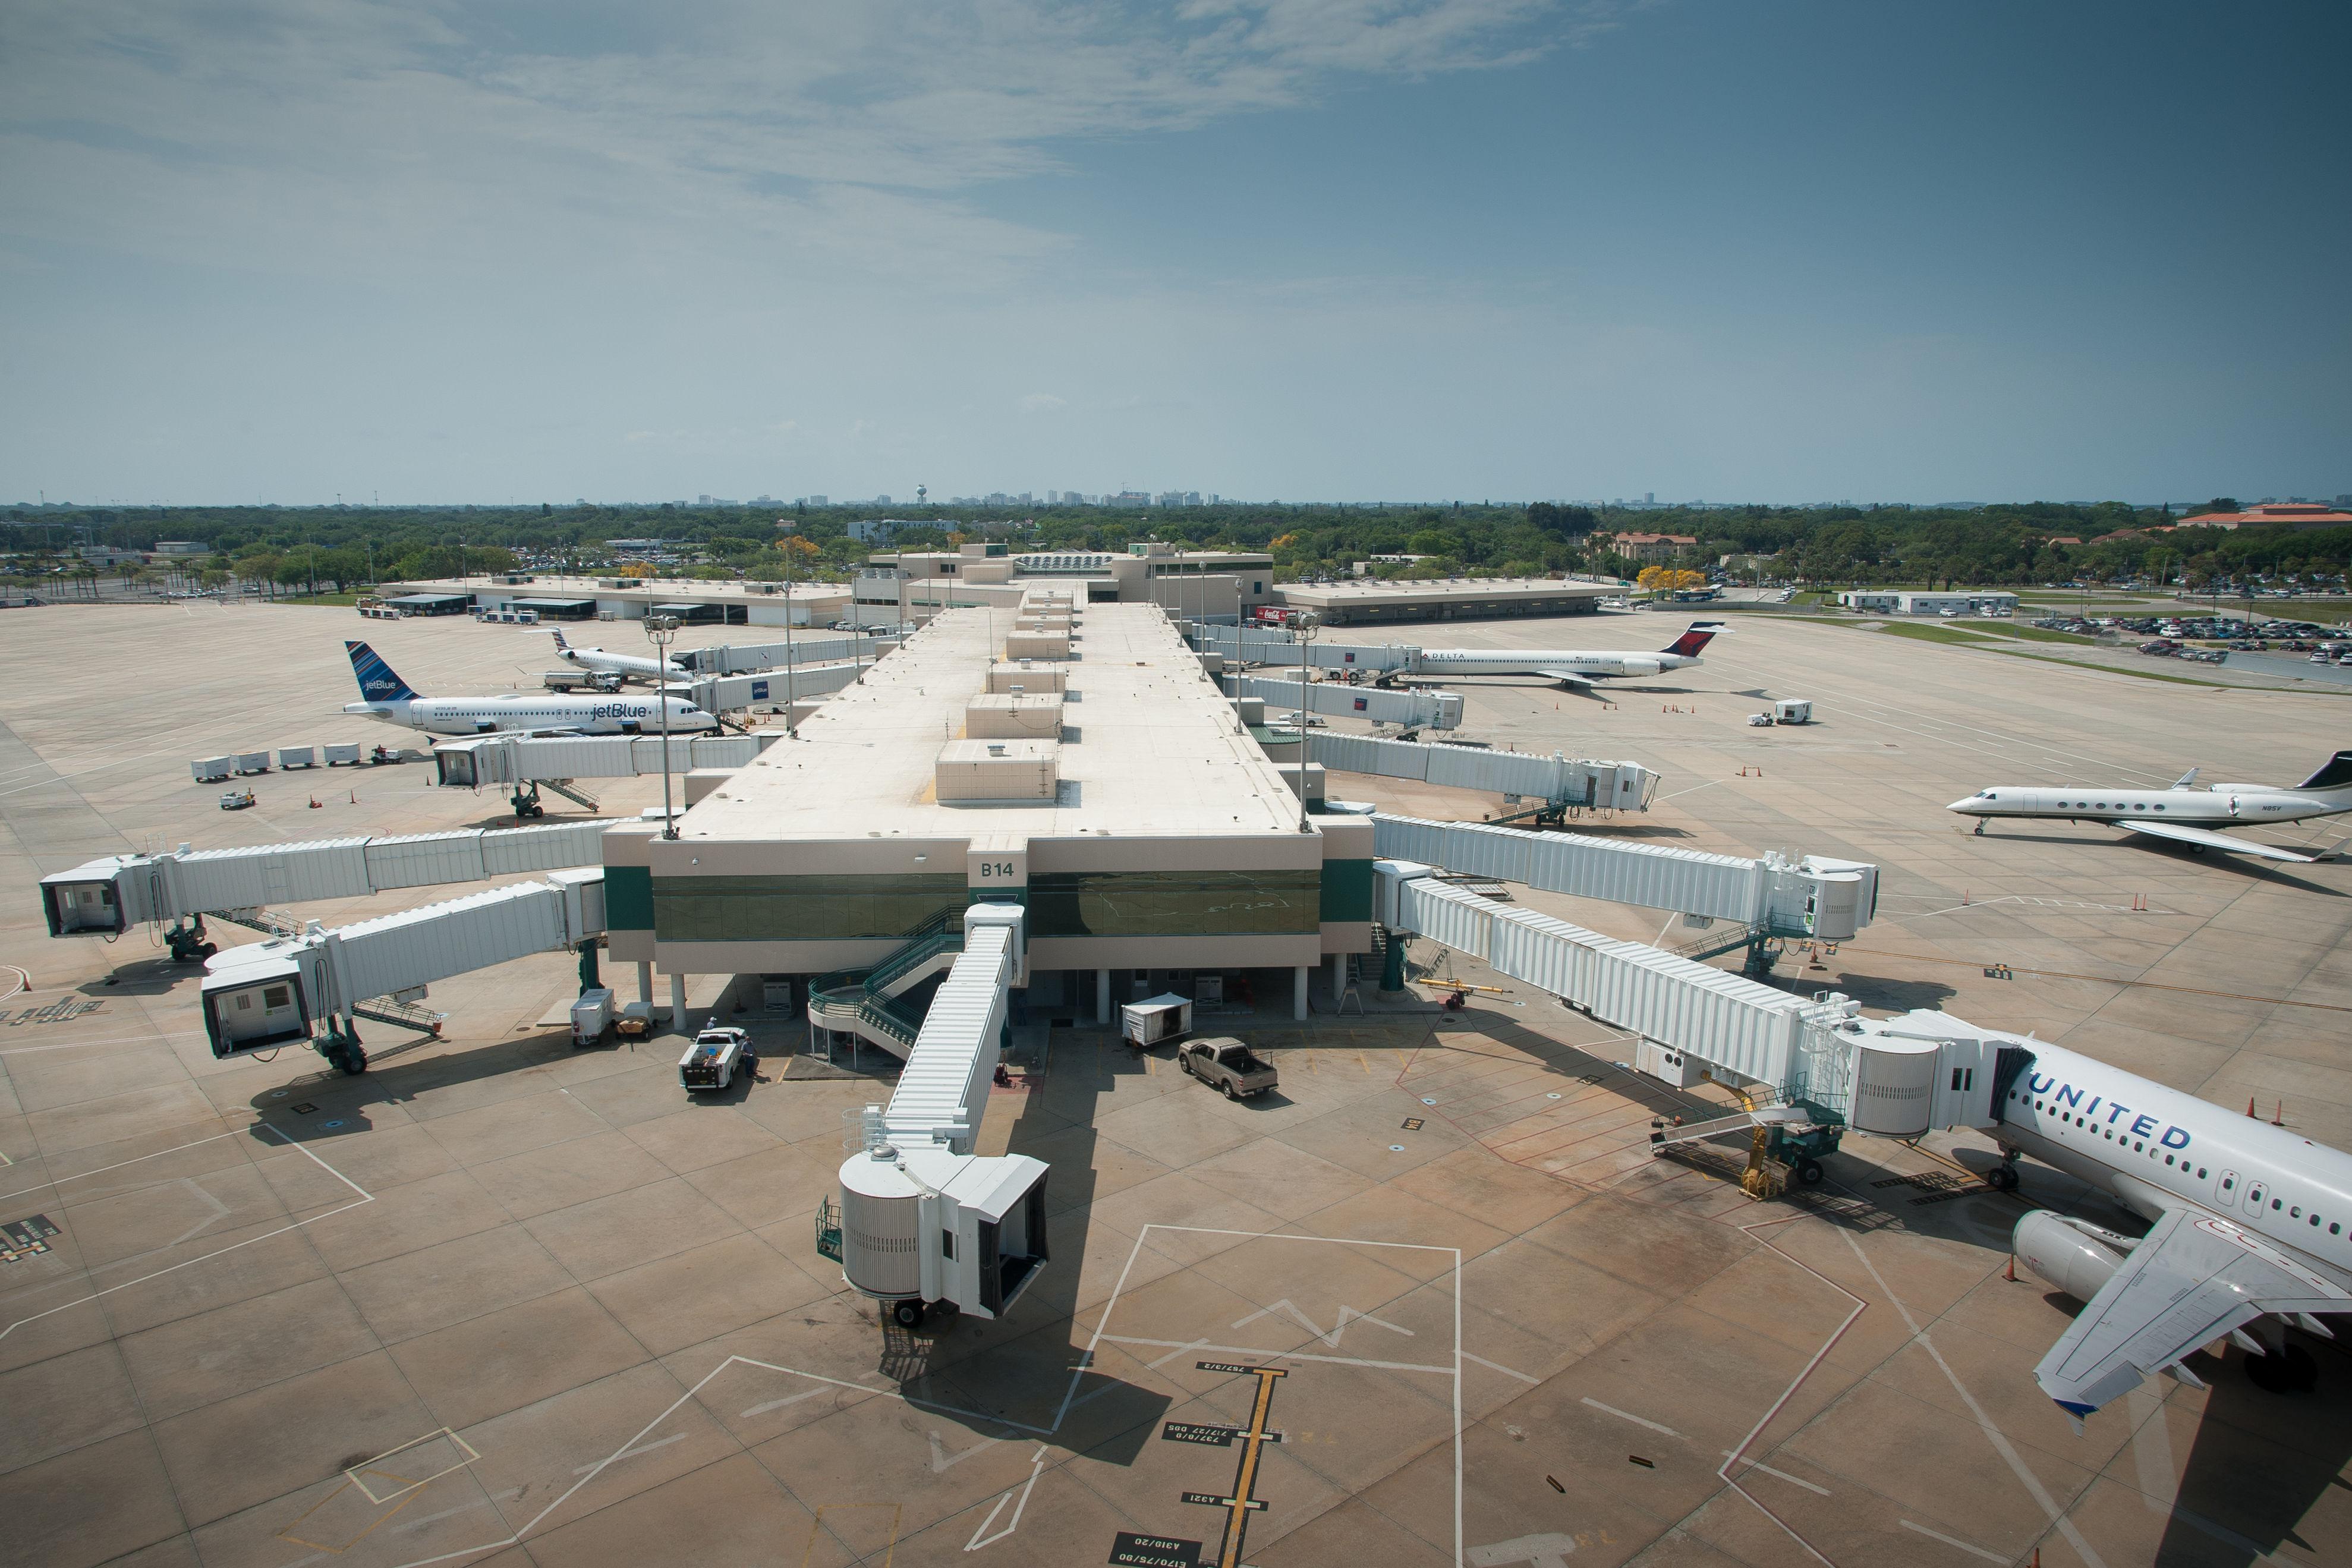 Sarasota bradenton international airport am8fcb